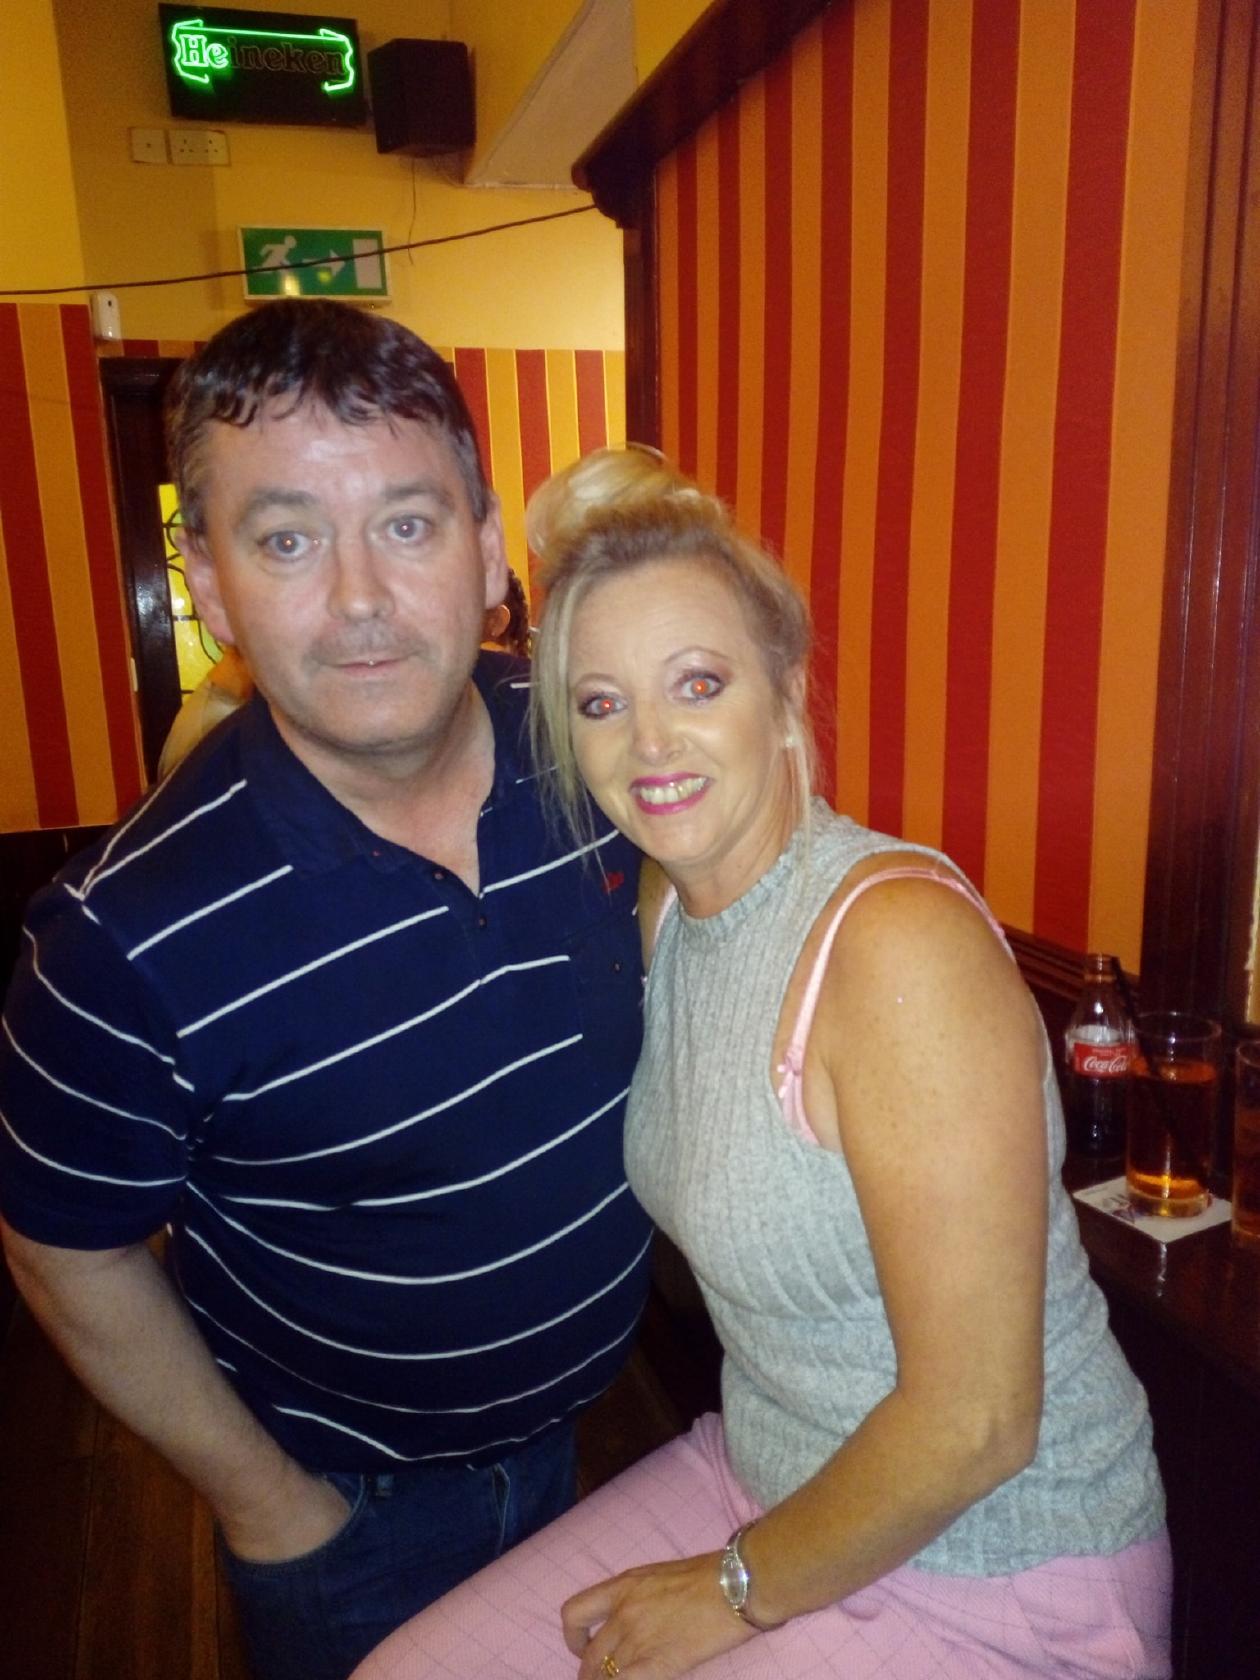 The Locke Bar - Pubs and bars - Limerick City | sil0.co.uk